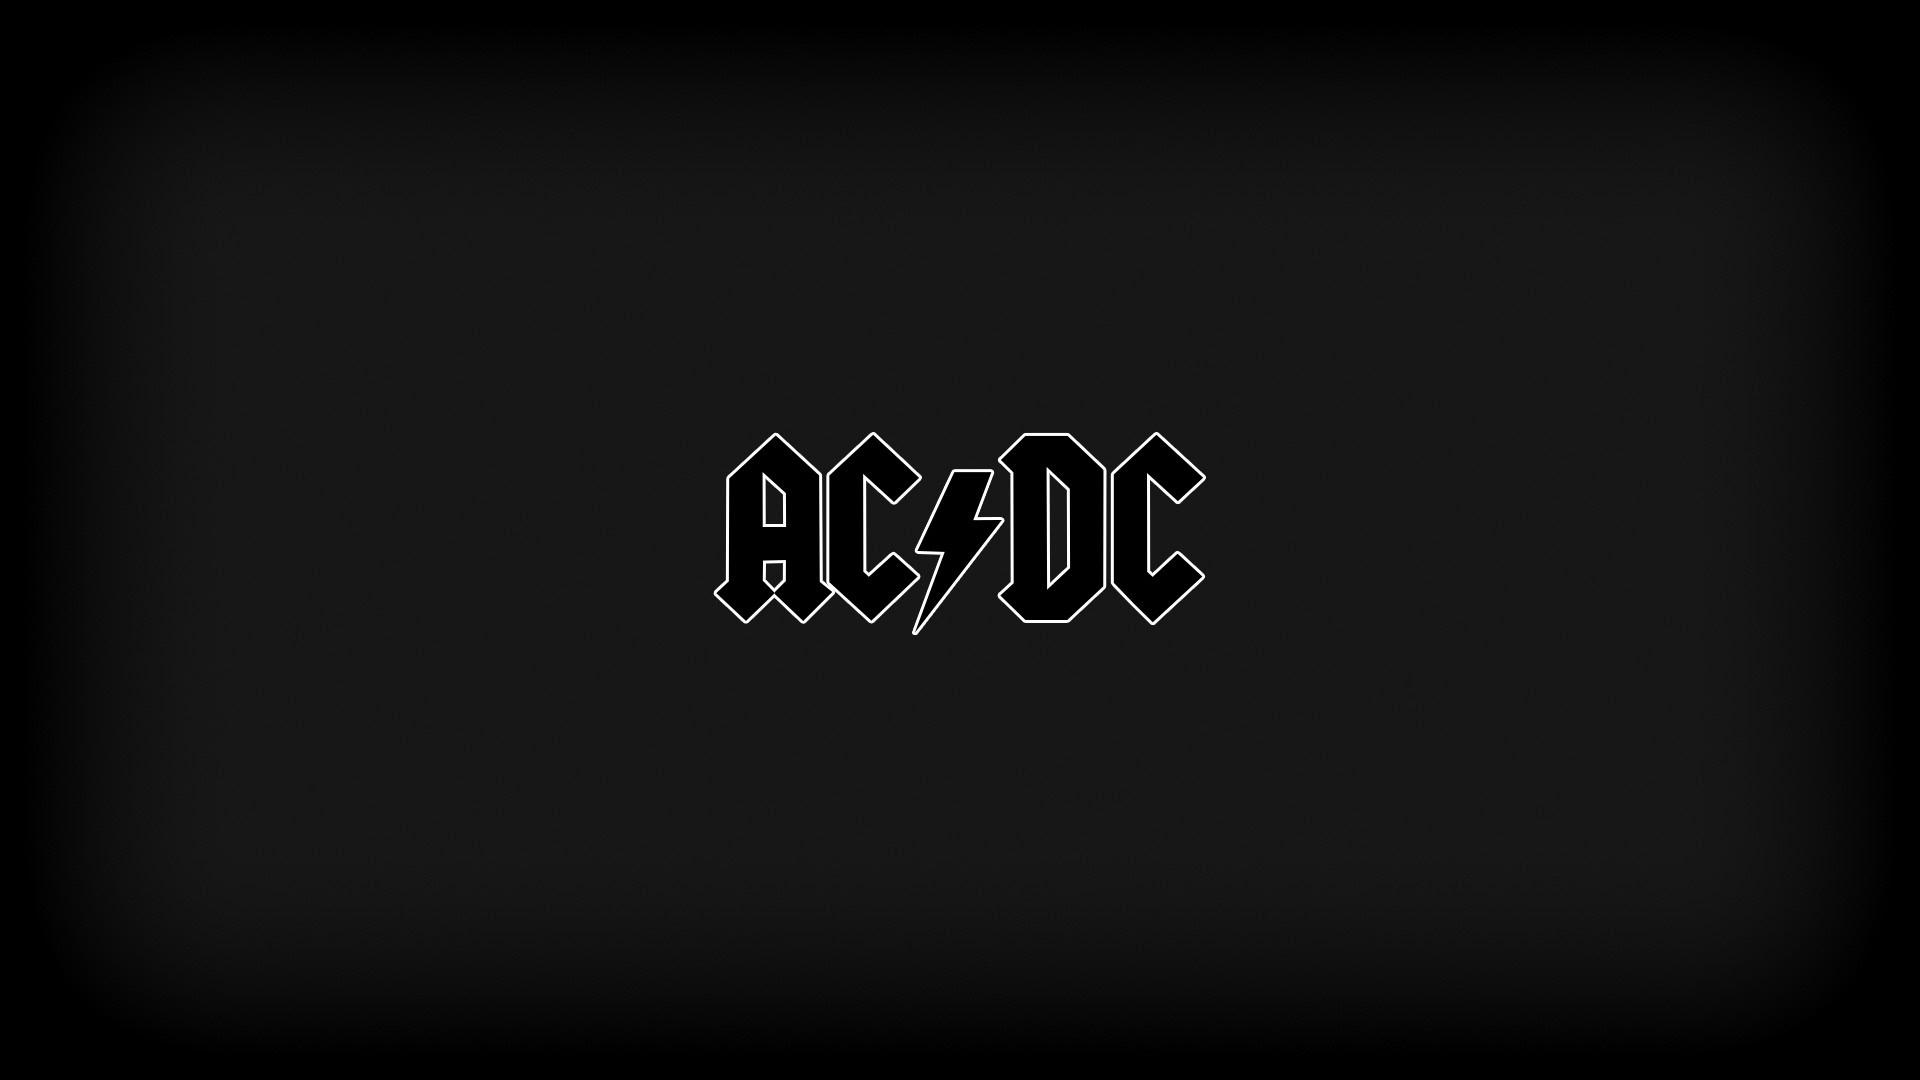 Ac Dc Wallpaper Hd 65 Images